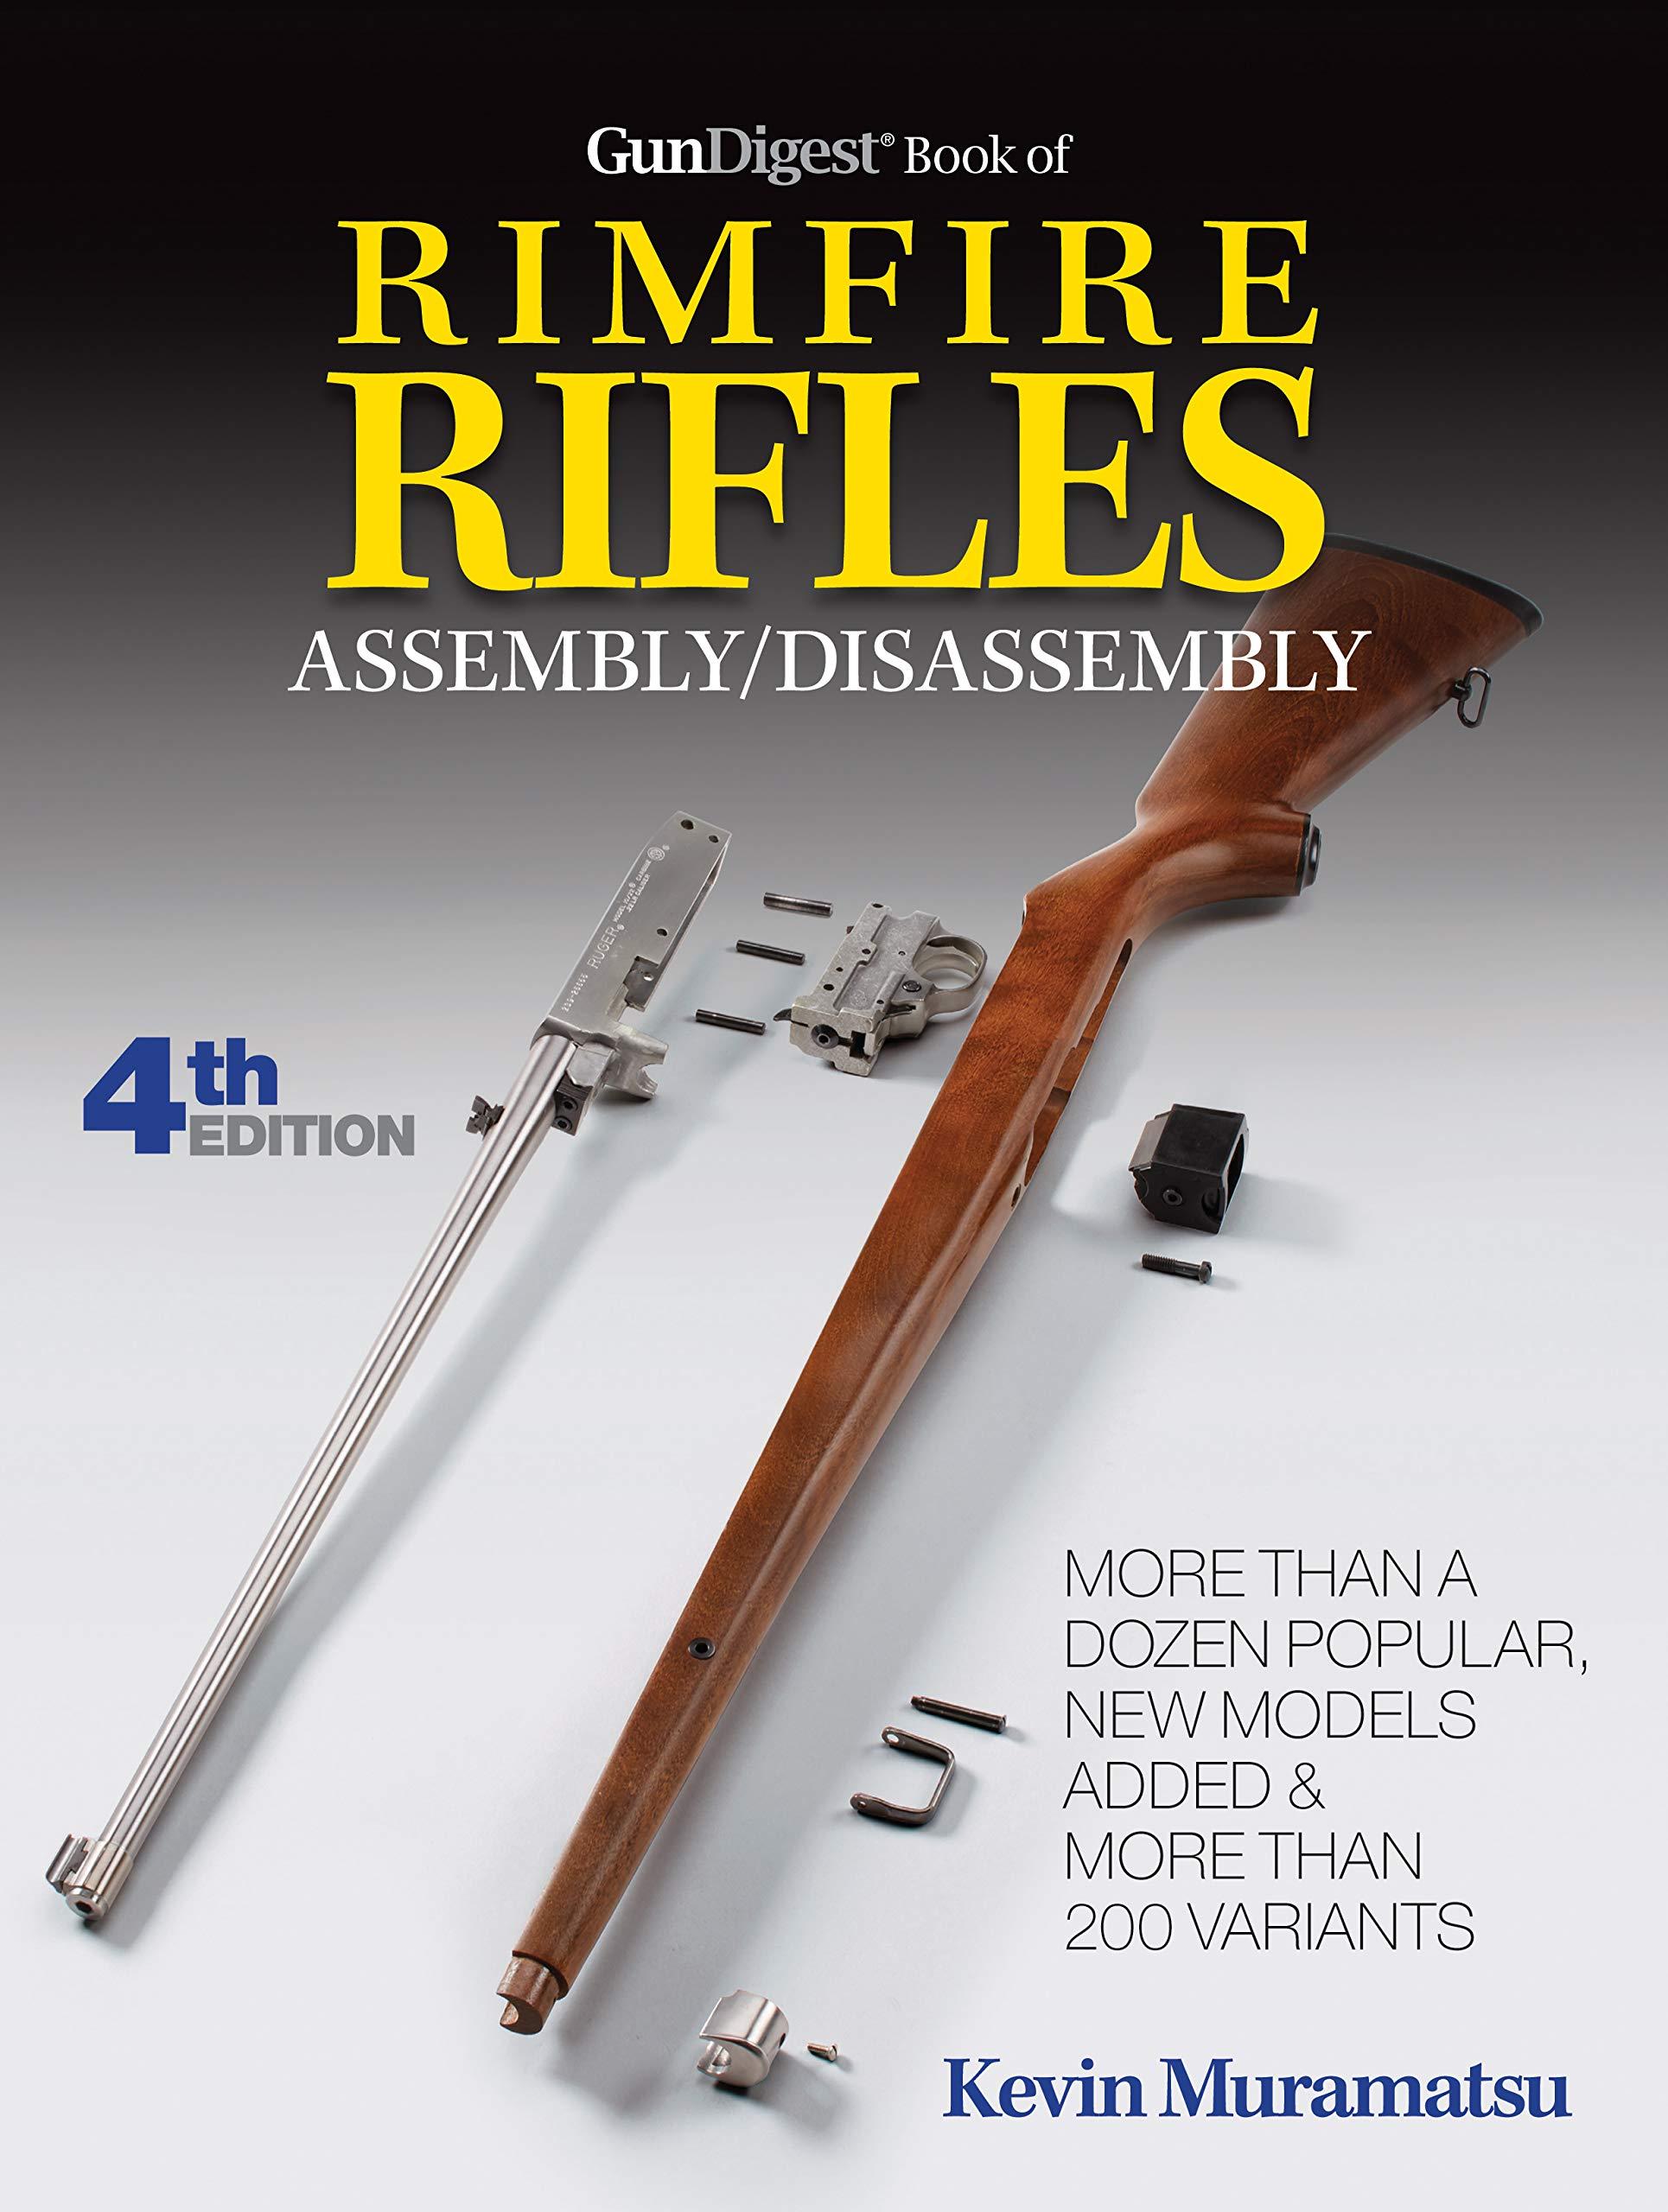 Gun Digest Book Of Rimfire Rifles Assembly/Disassembly: Kevin Muramatsu:  0074962018984: Amazon.com: Books